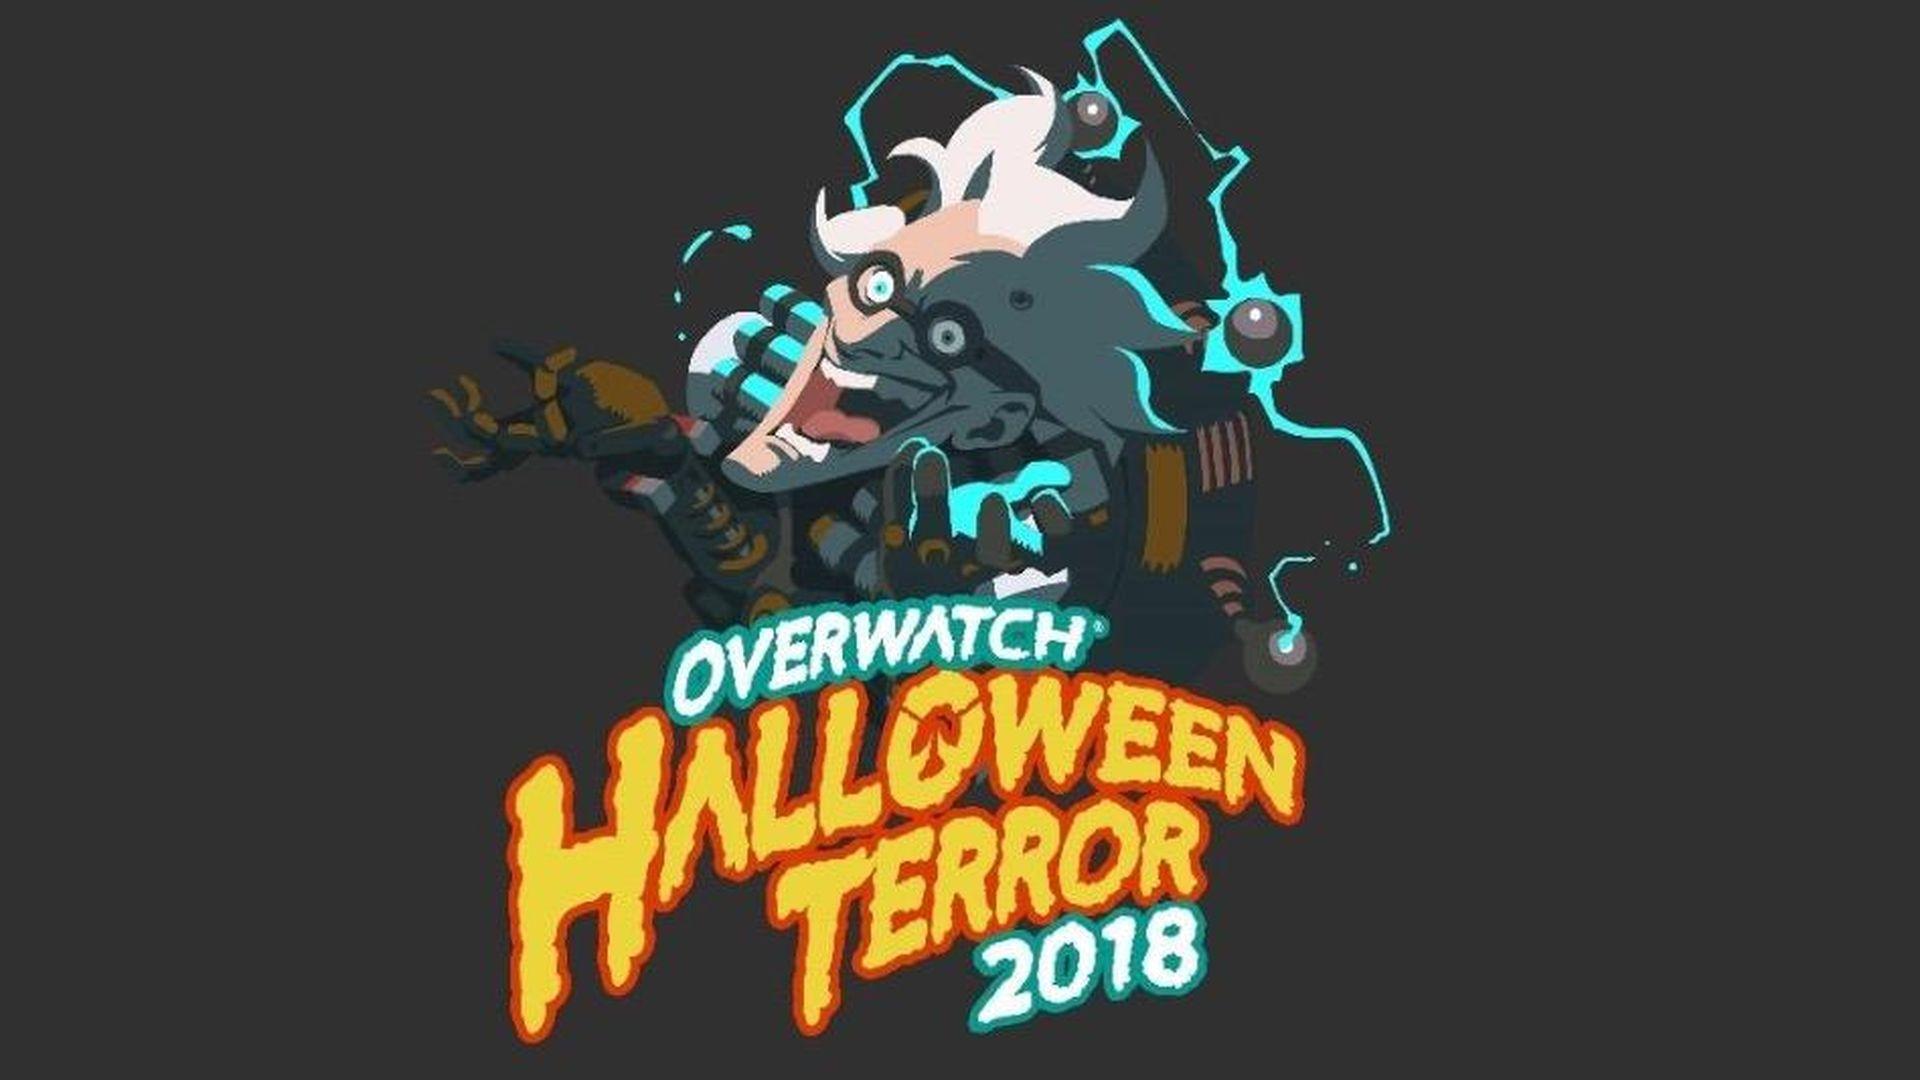 Blizzard Overwatch Halloween Terror